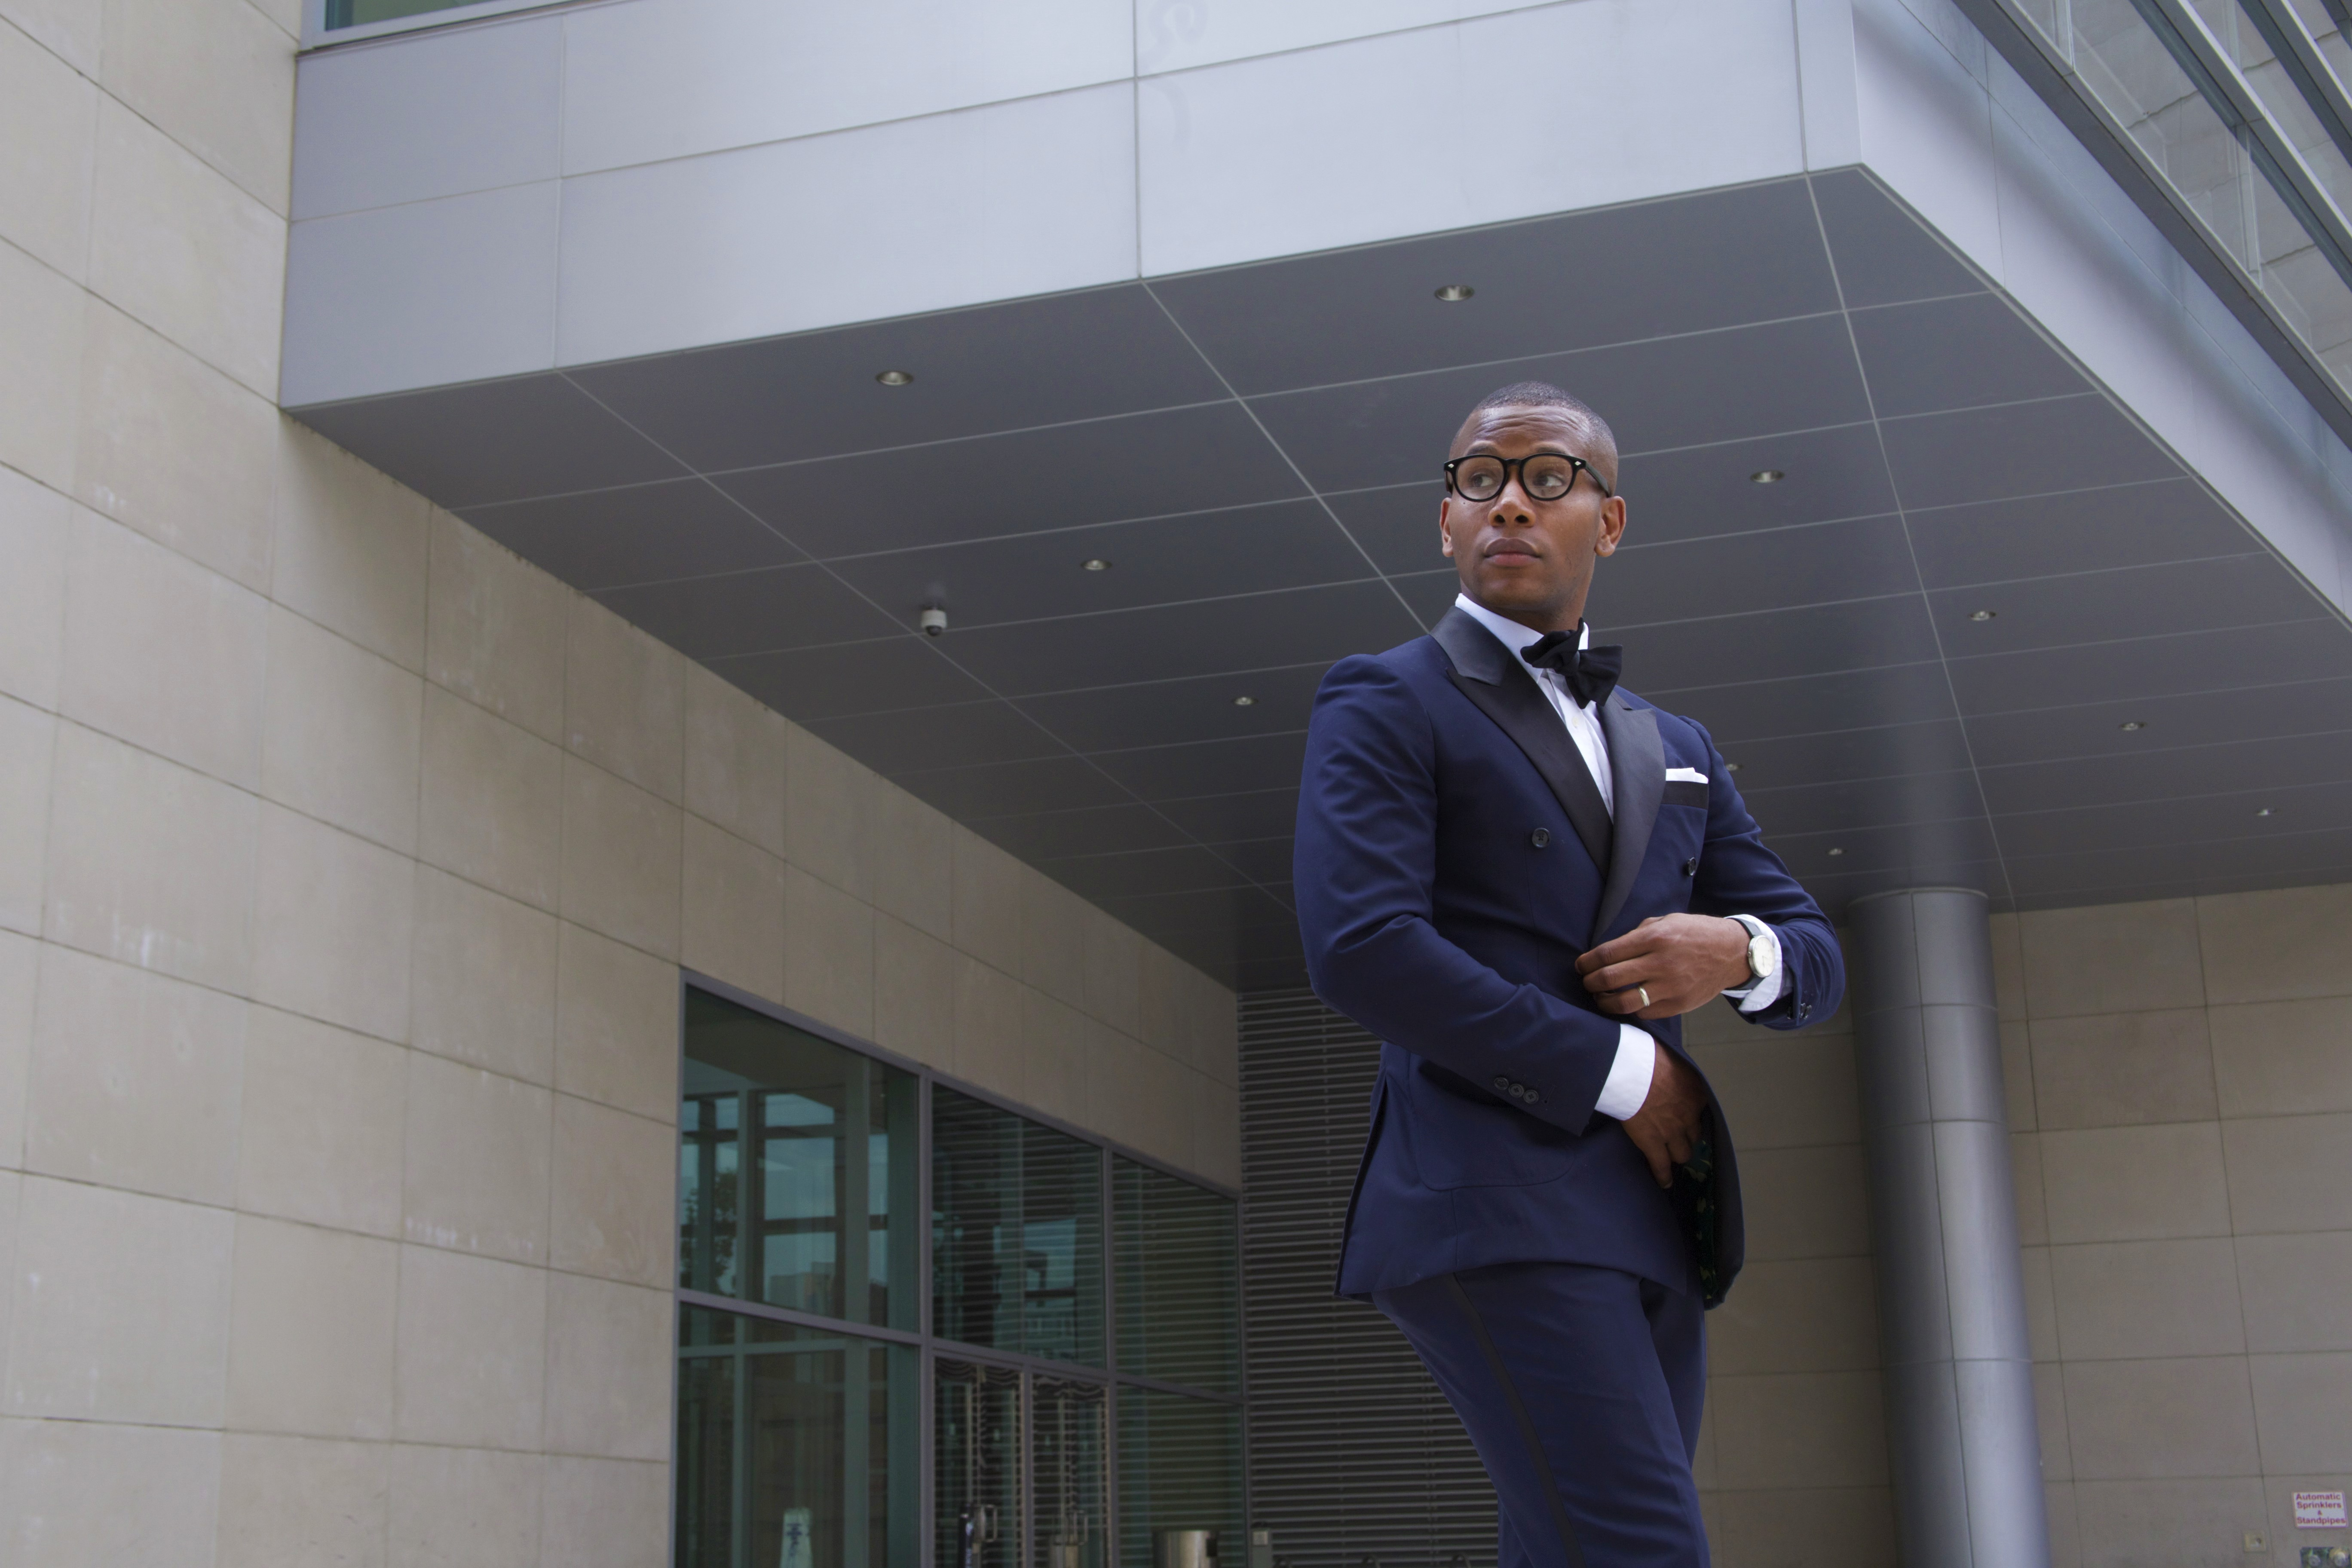 Sabir M. Peele of Men's Style Pro wearing The Napa Slipper 11